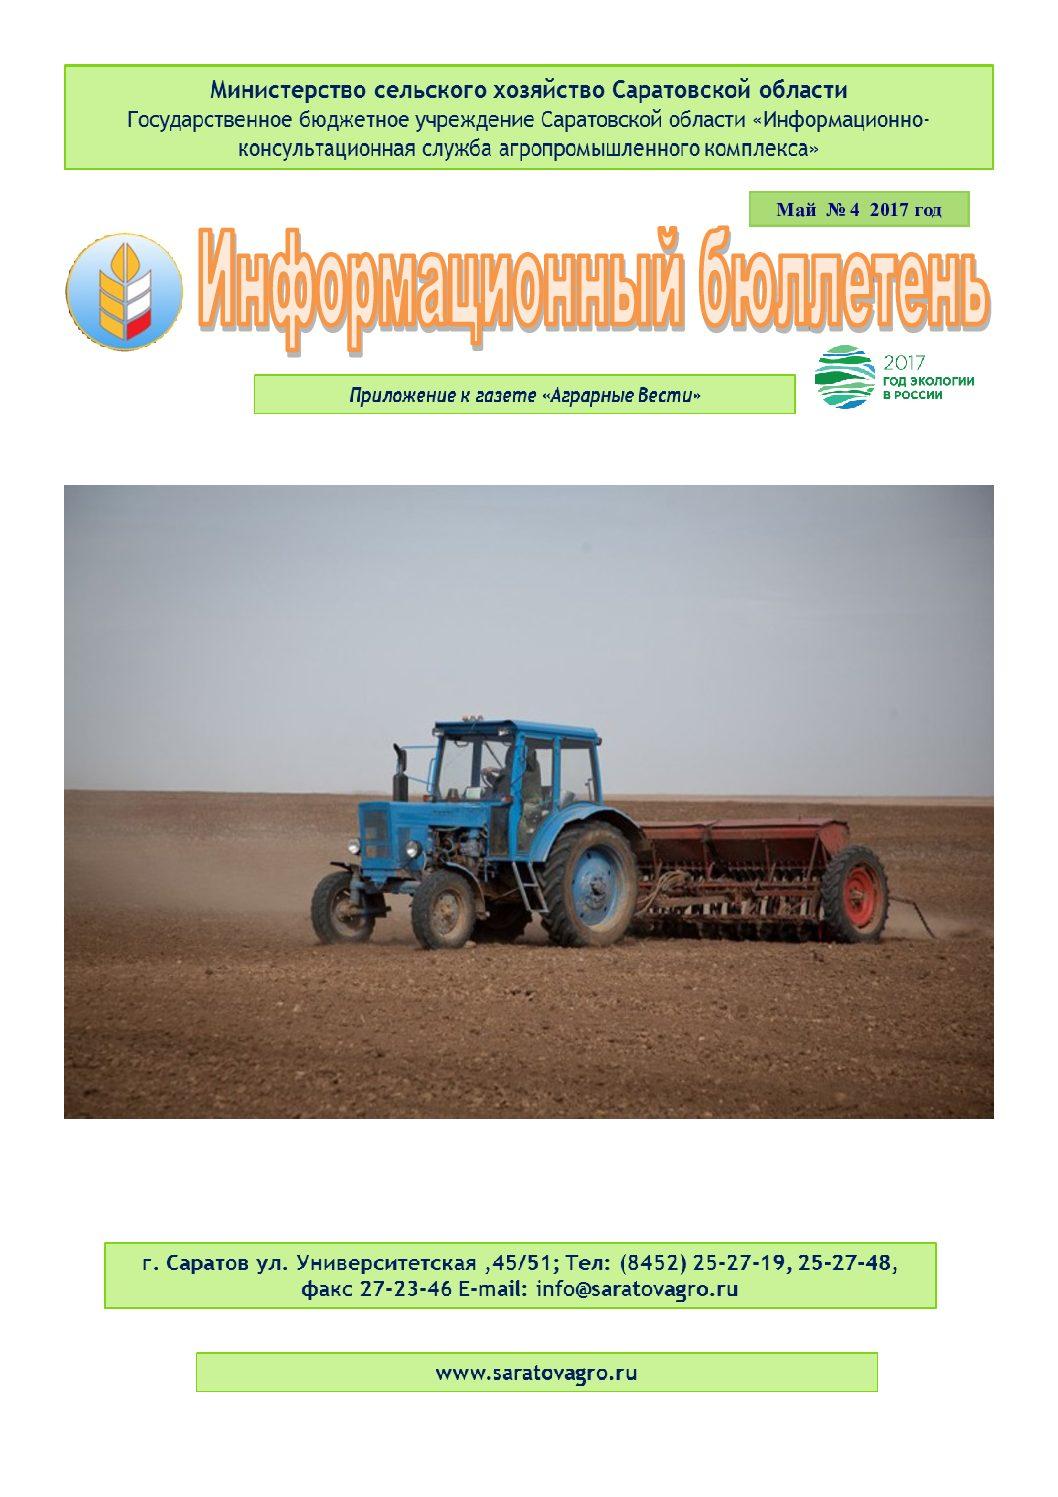 https://saratovagro.ru/wp-content/uploads/2020/08/4.2017-pdf.jpg